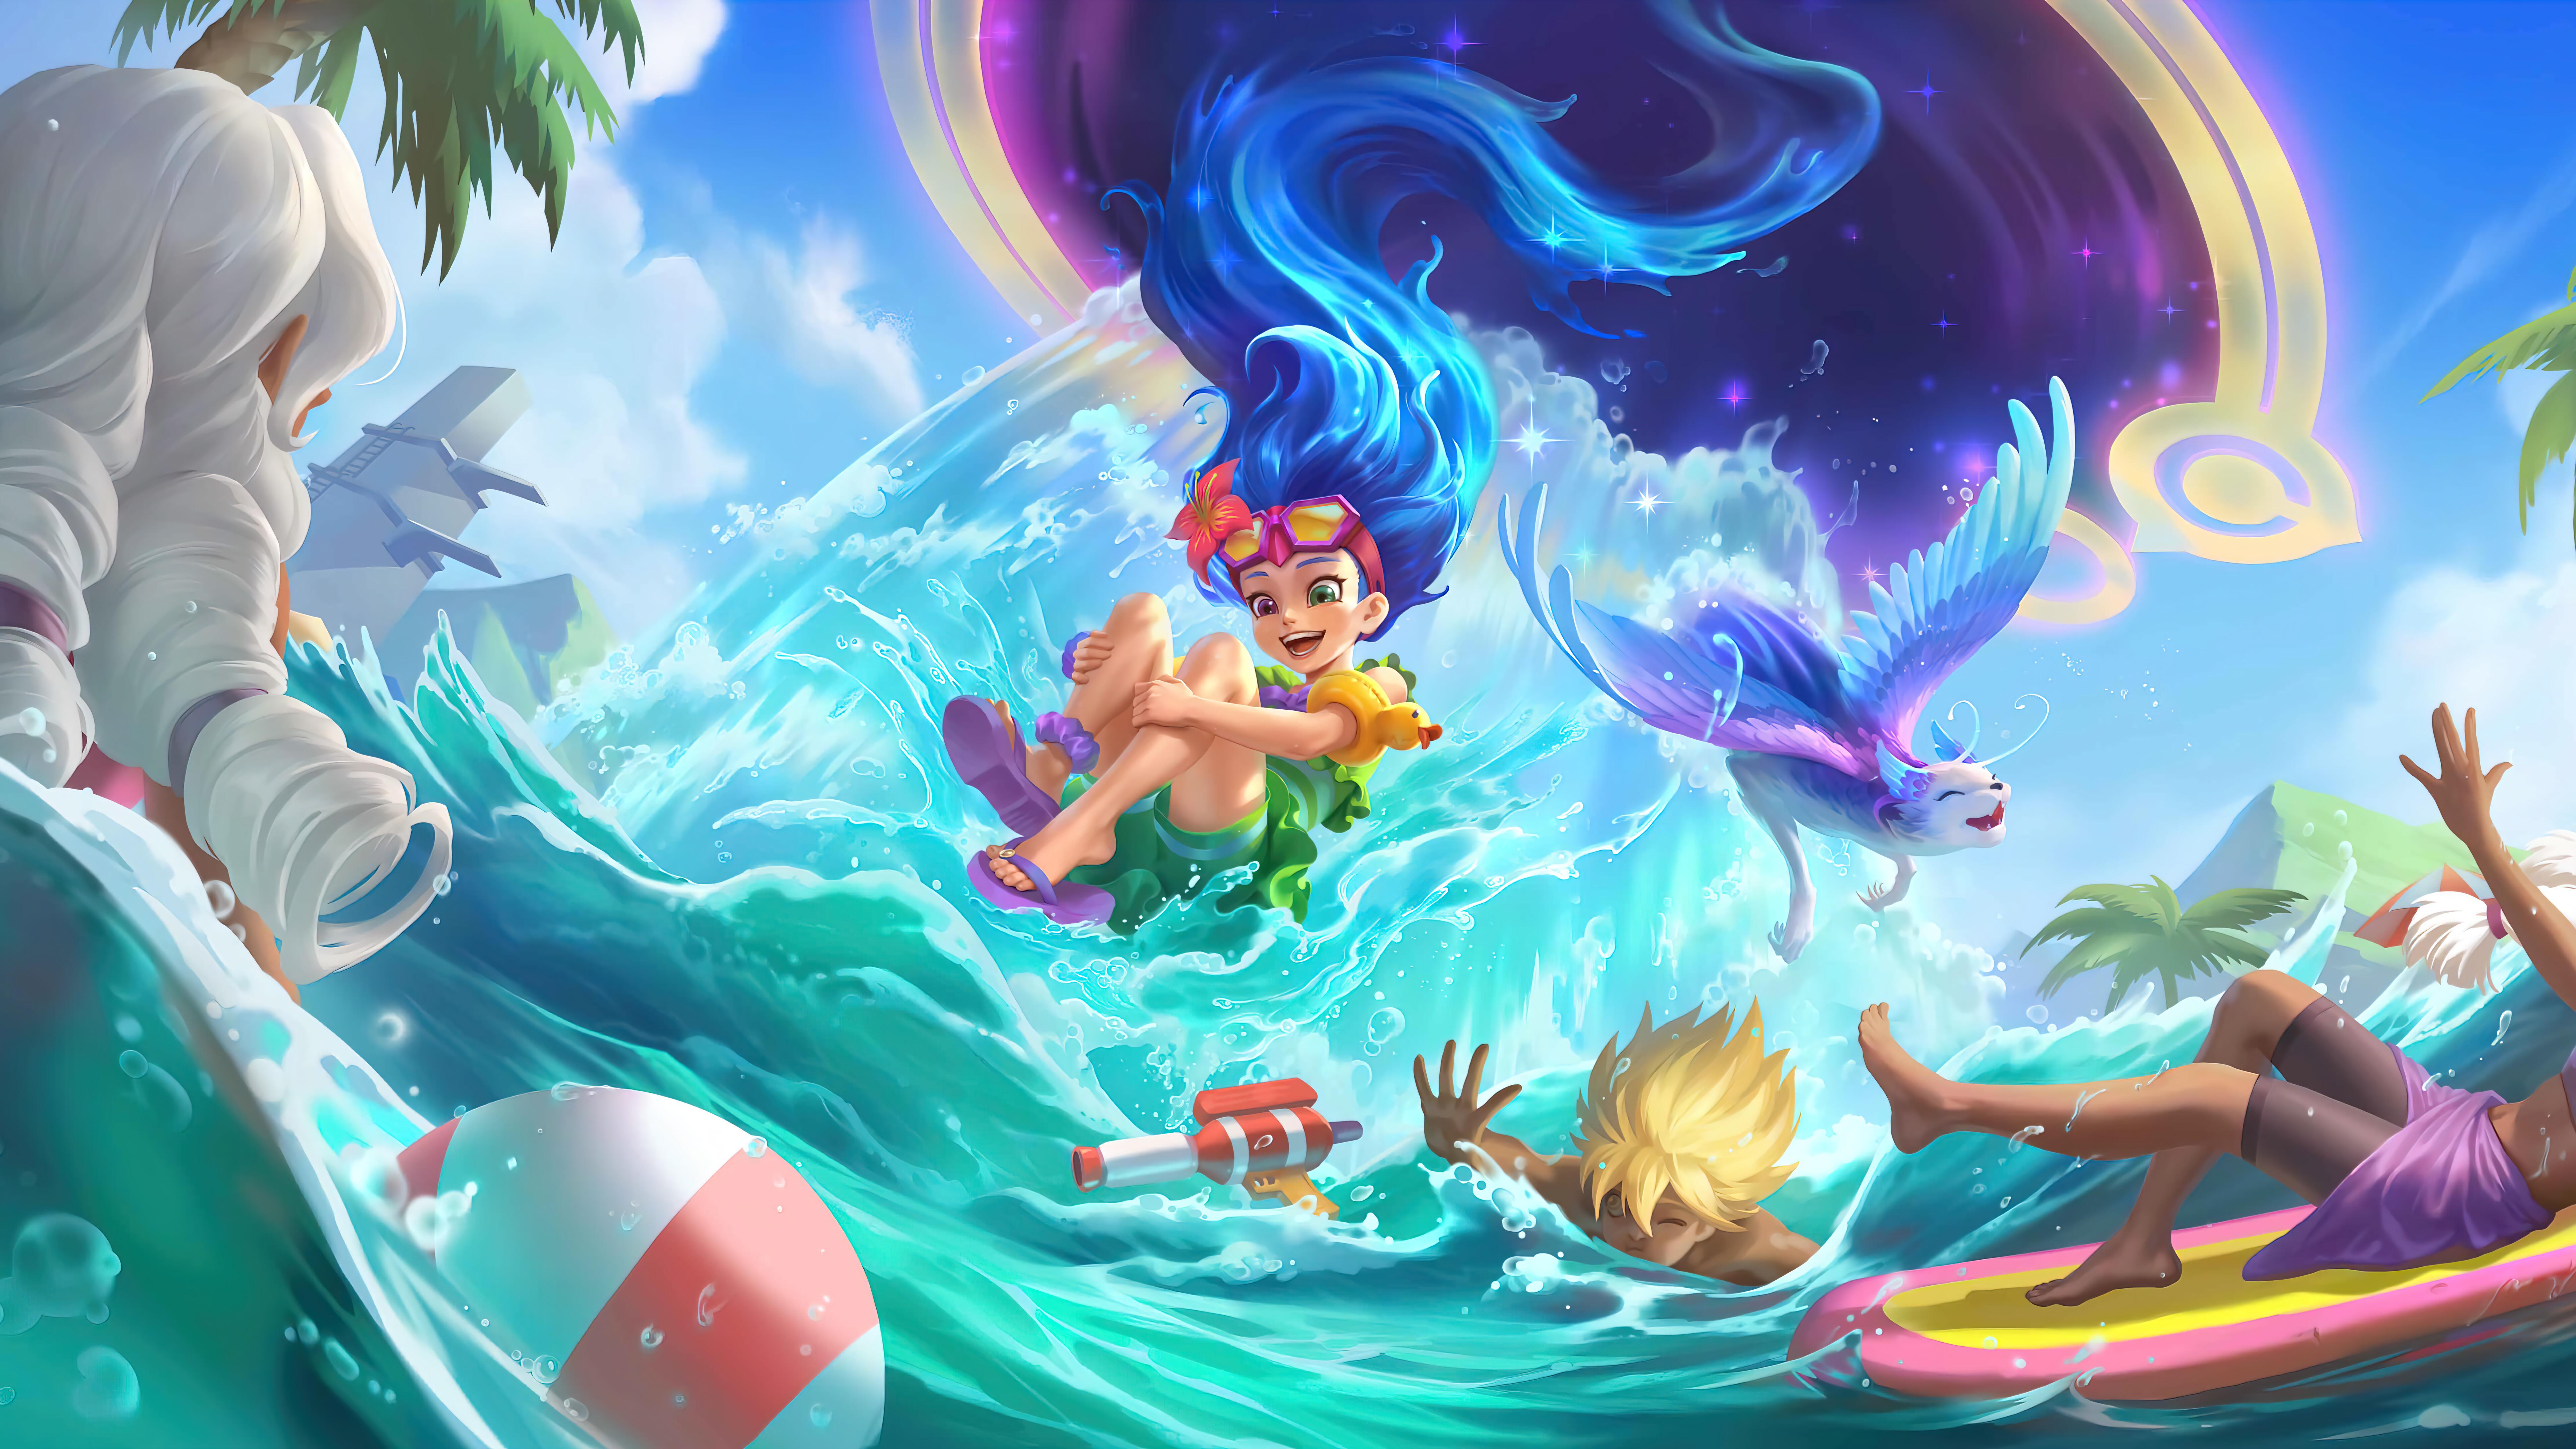 Wallpaper Pool Part Zoe League of Legends